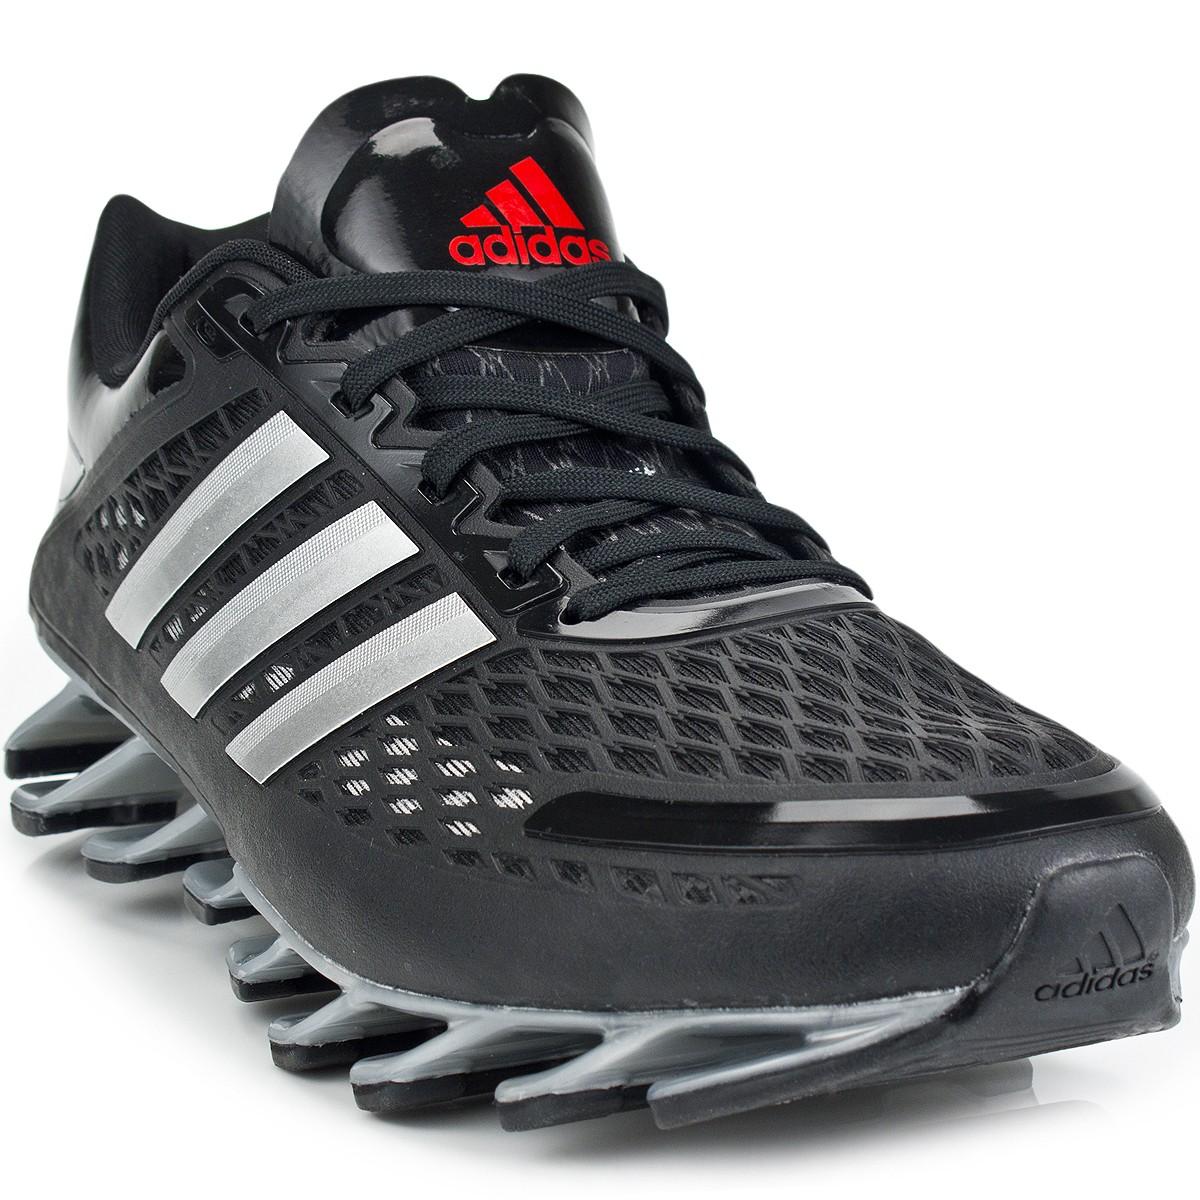 26f98cc2cf6 Tênis Adidas Springblade Razor